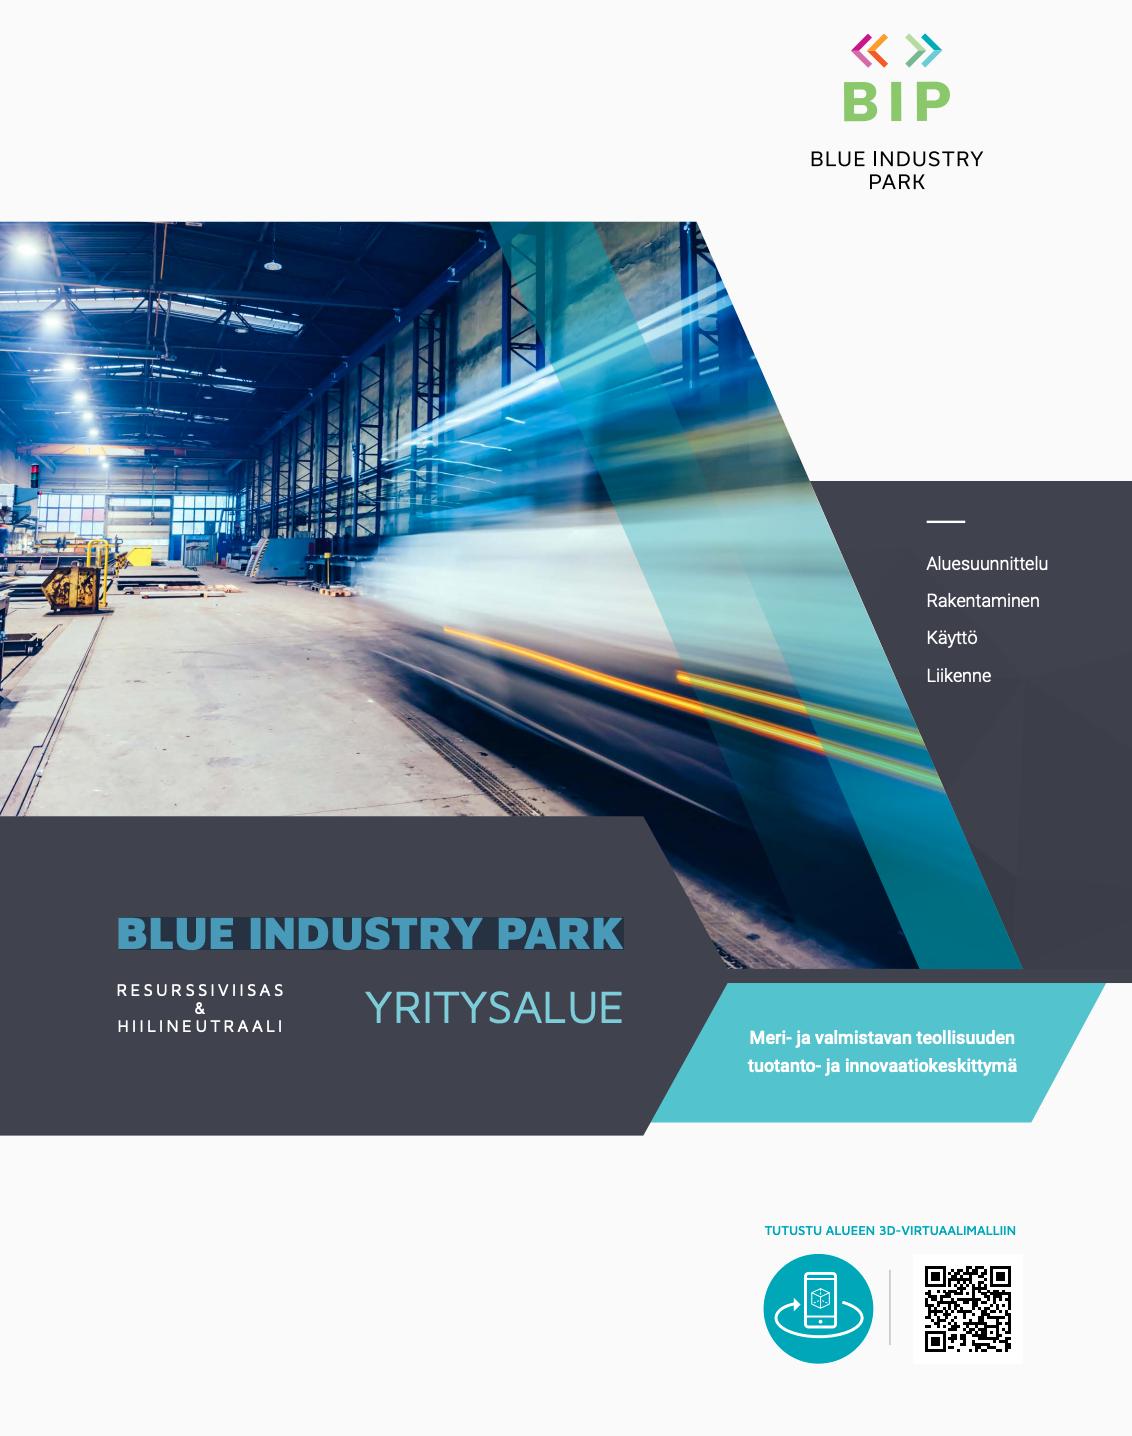 Cover for article 'Opas: Blue Industry Park – Resurssiviisas ja hiilineutraali yritysalue'